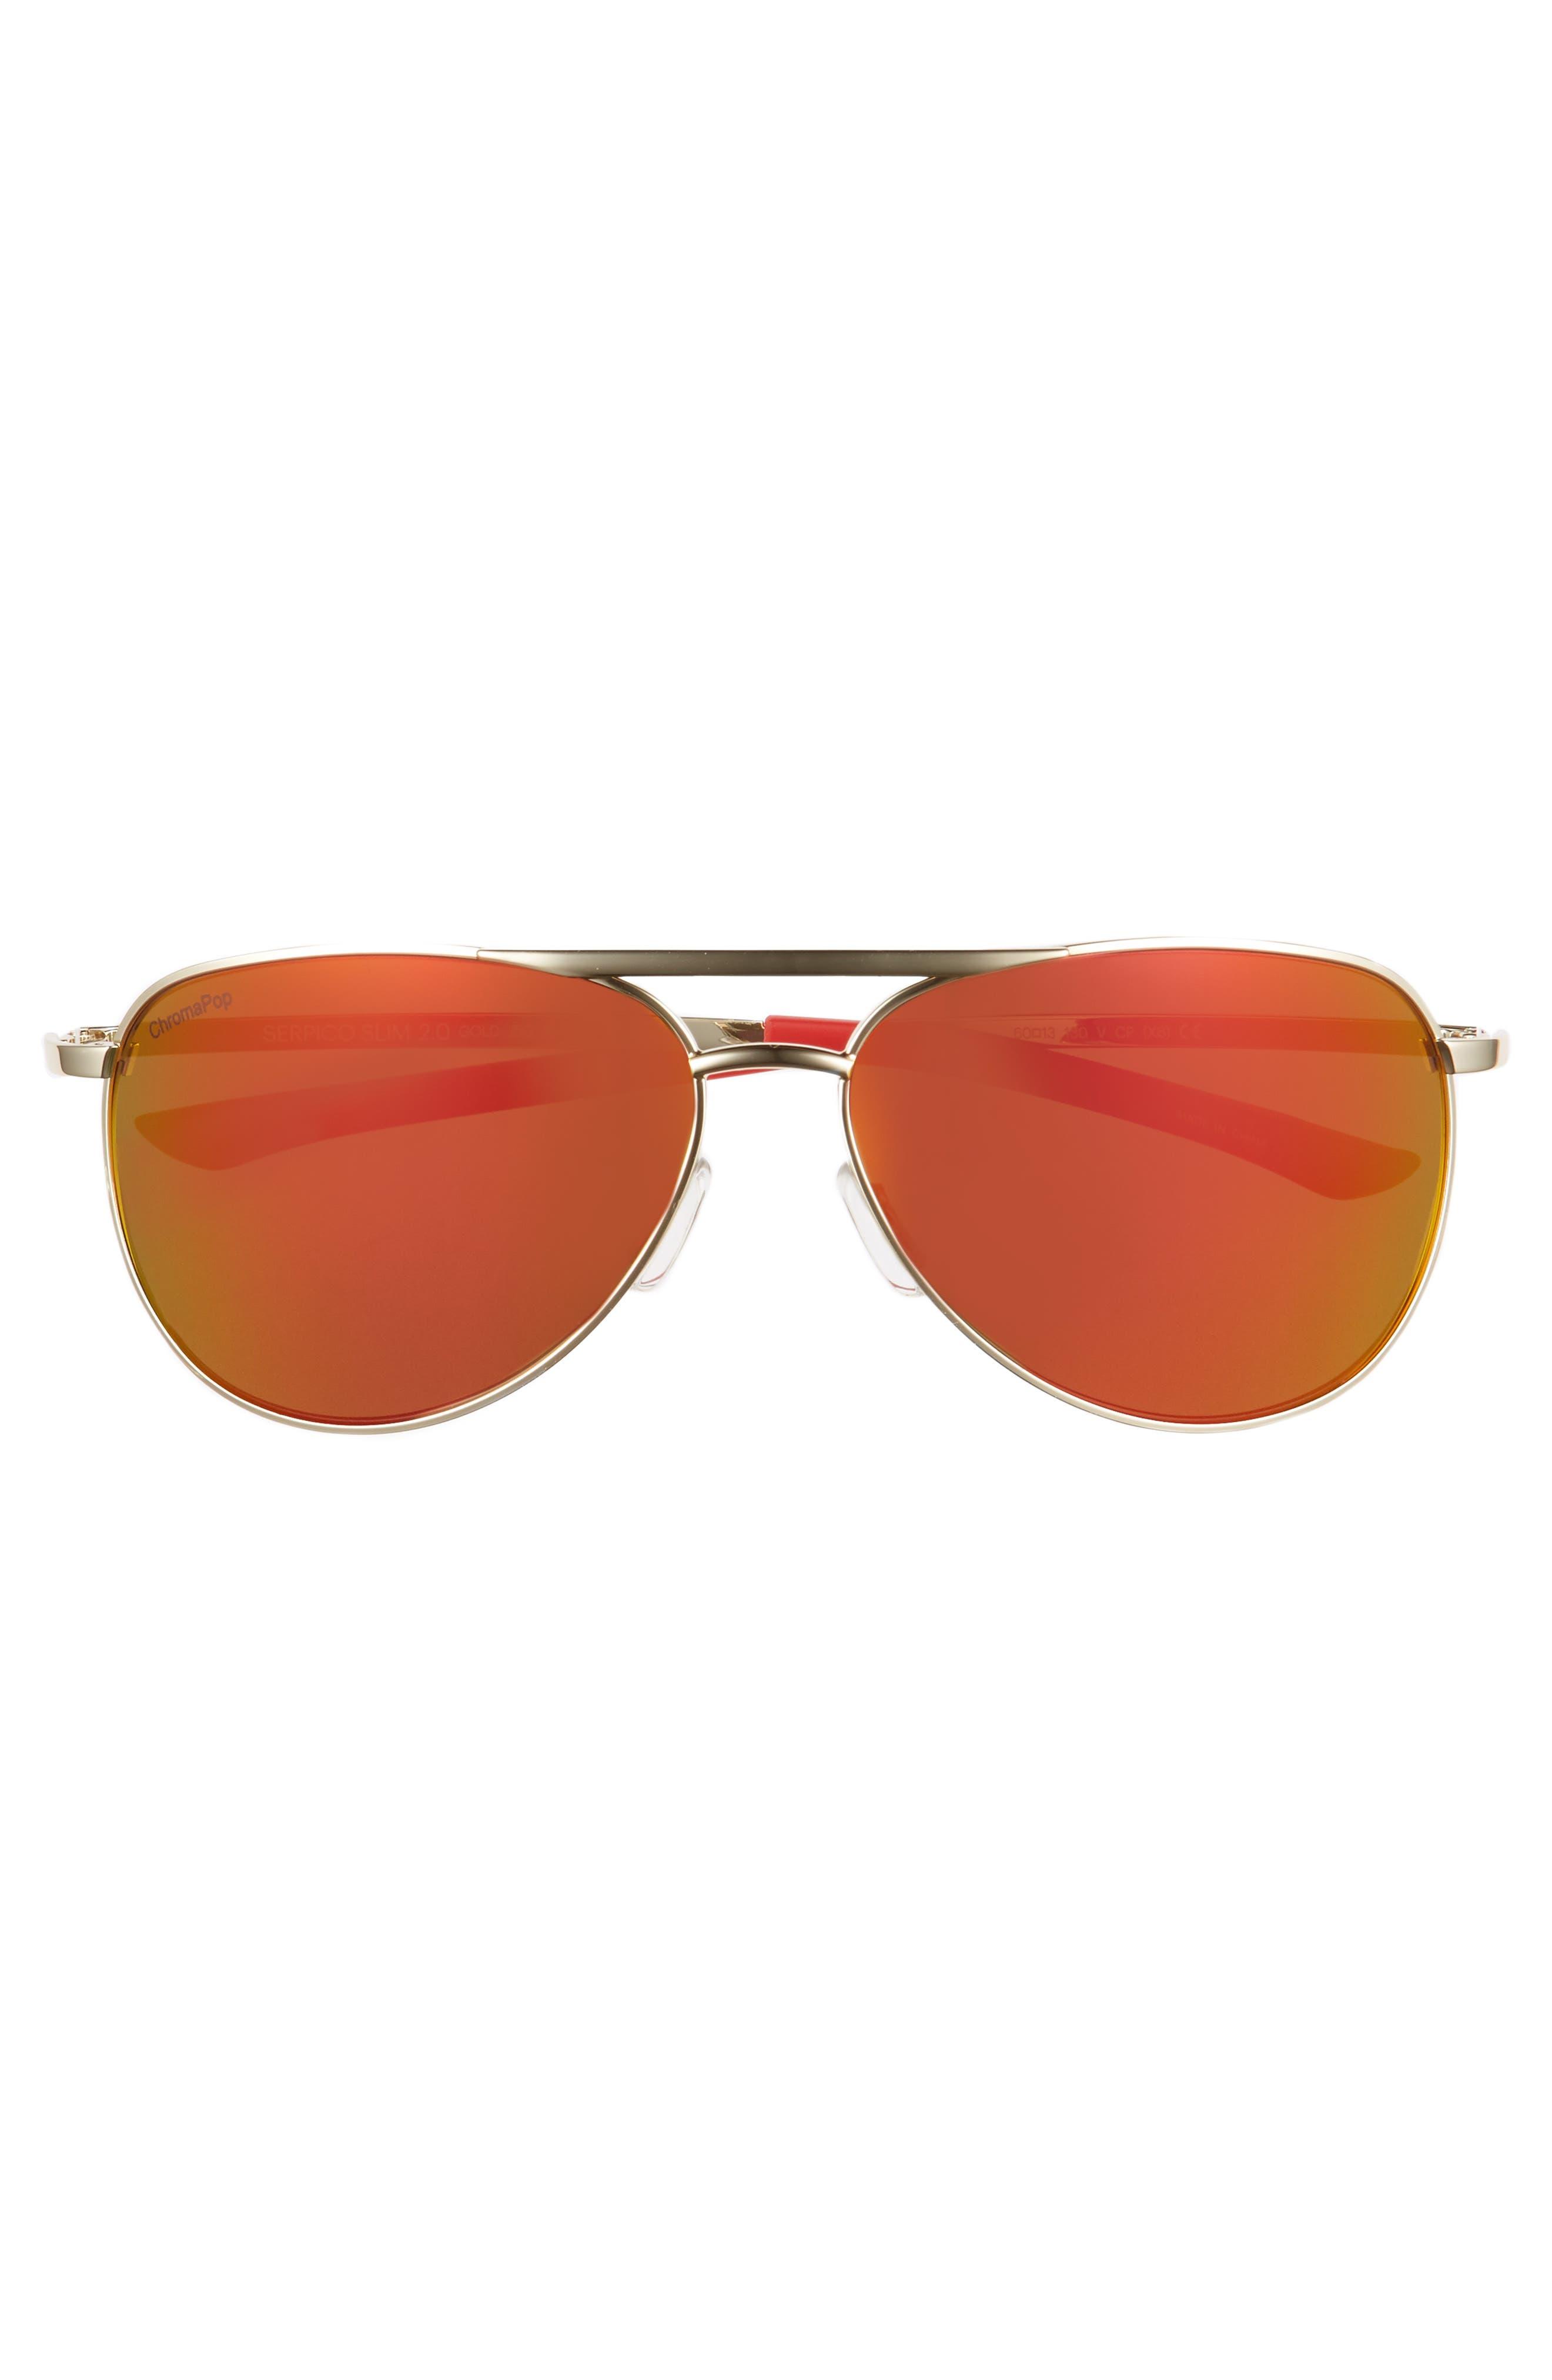 Alternate Image 3  - Smith Serpico Slim 2.0 60mm ChromaPop Polarized Aviator Sunglasses